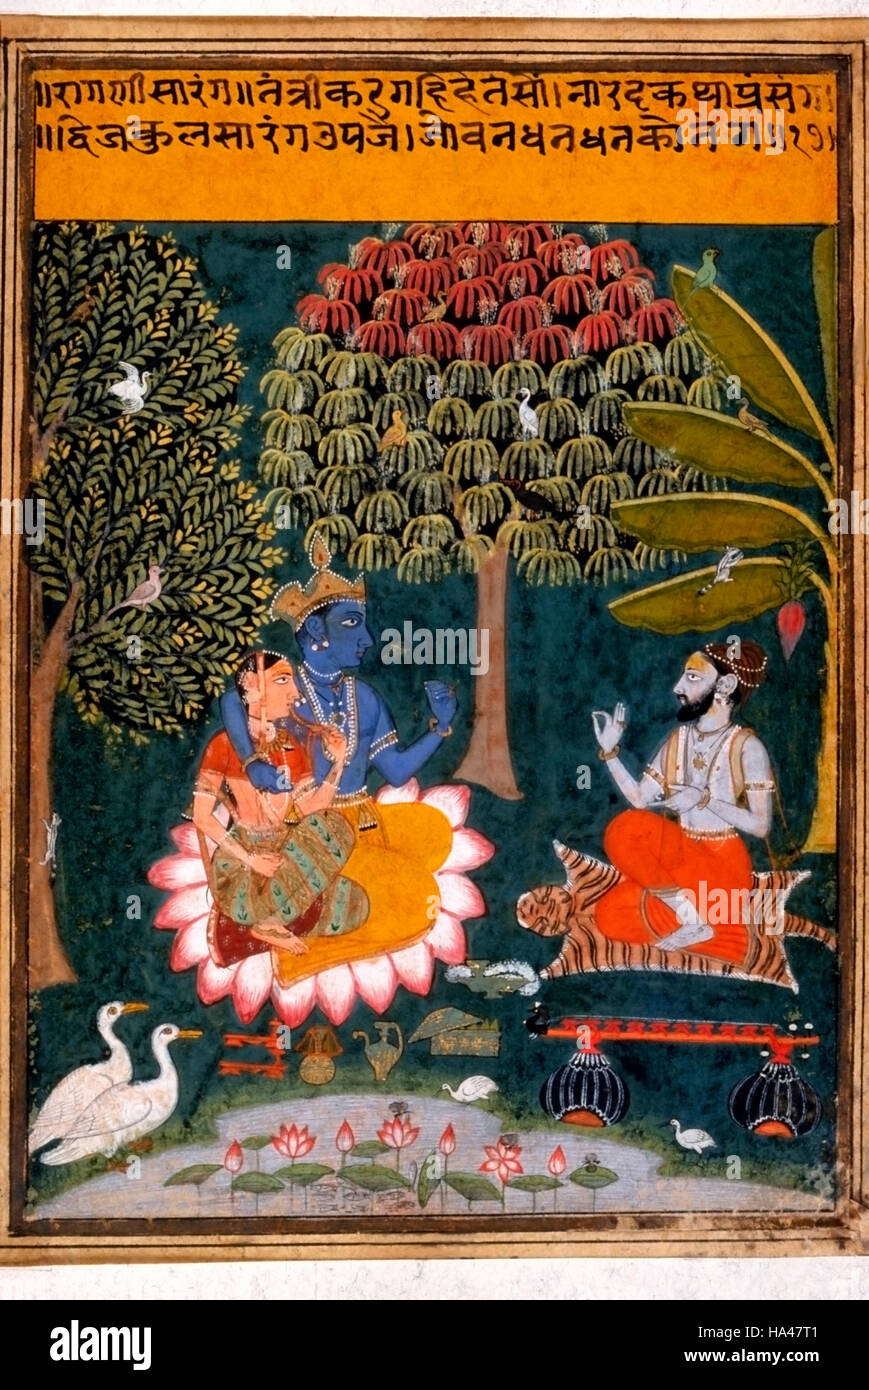 Ragamala Painting: Megha Malhar: Depicts monsoon, Krishna, the most popular Indian deities - Stock Image